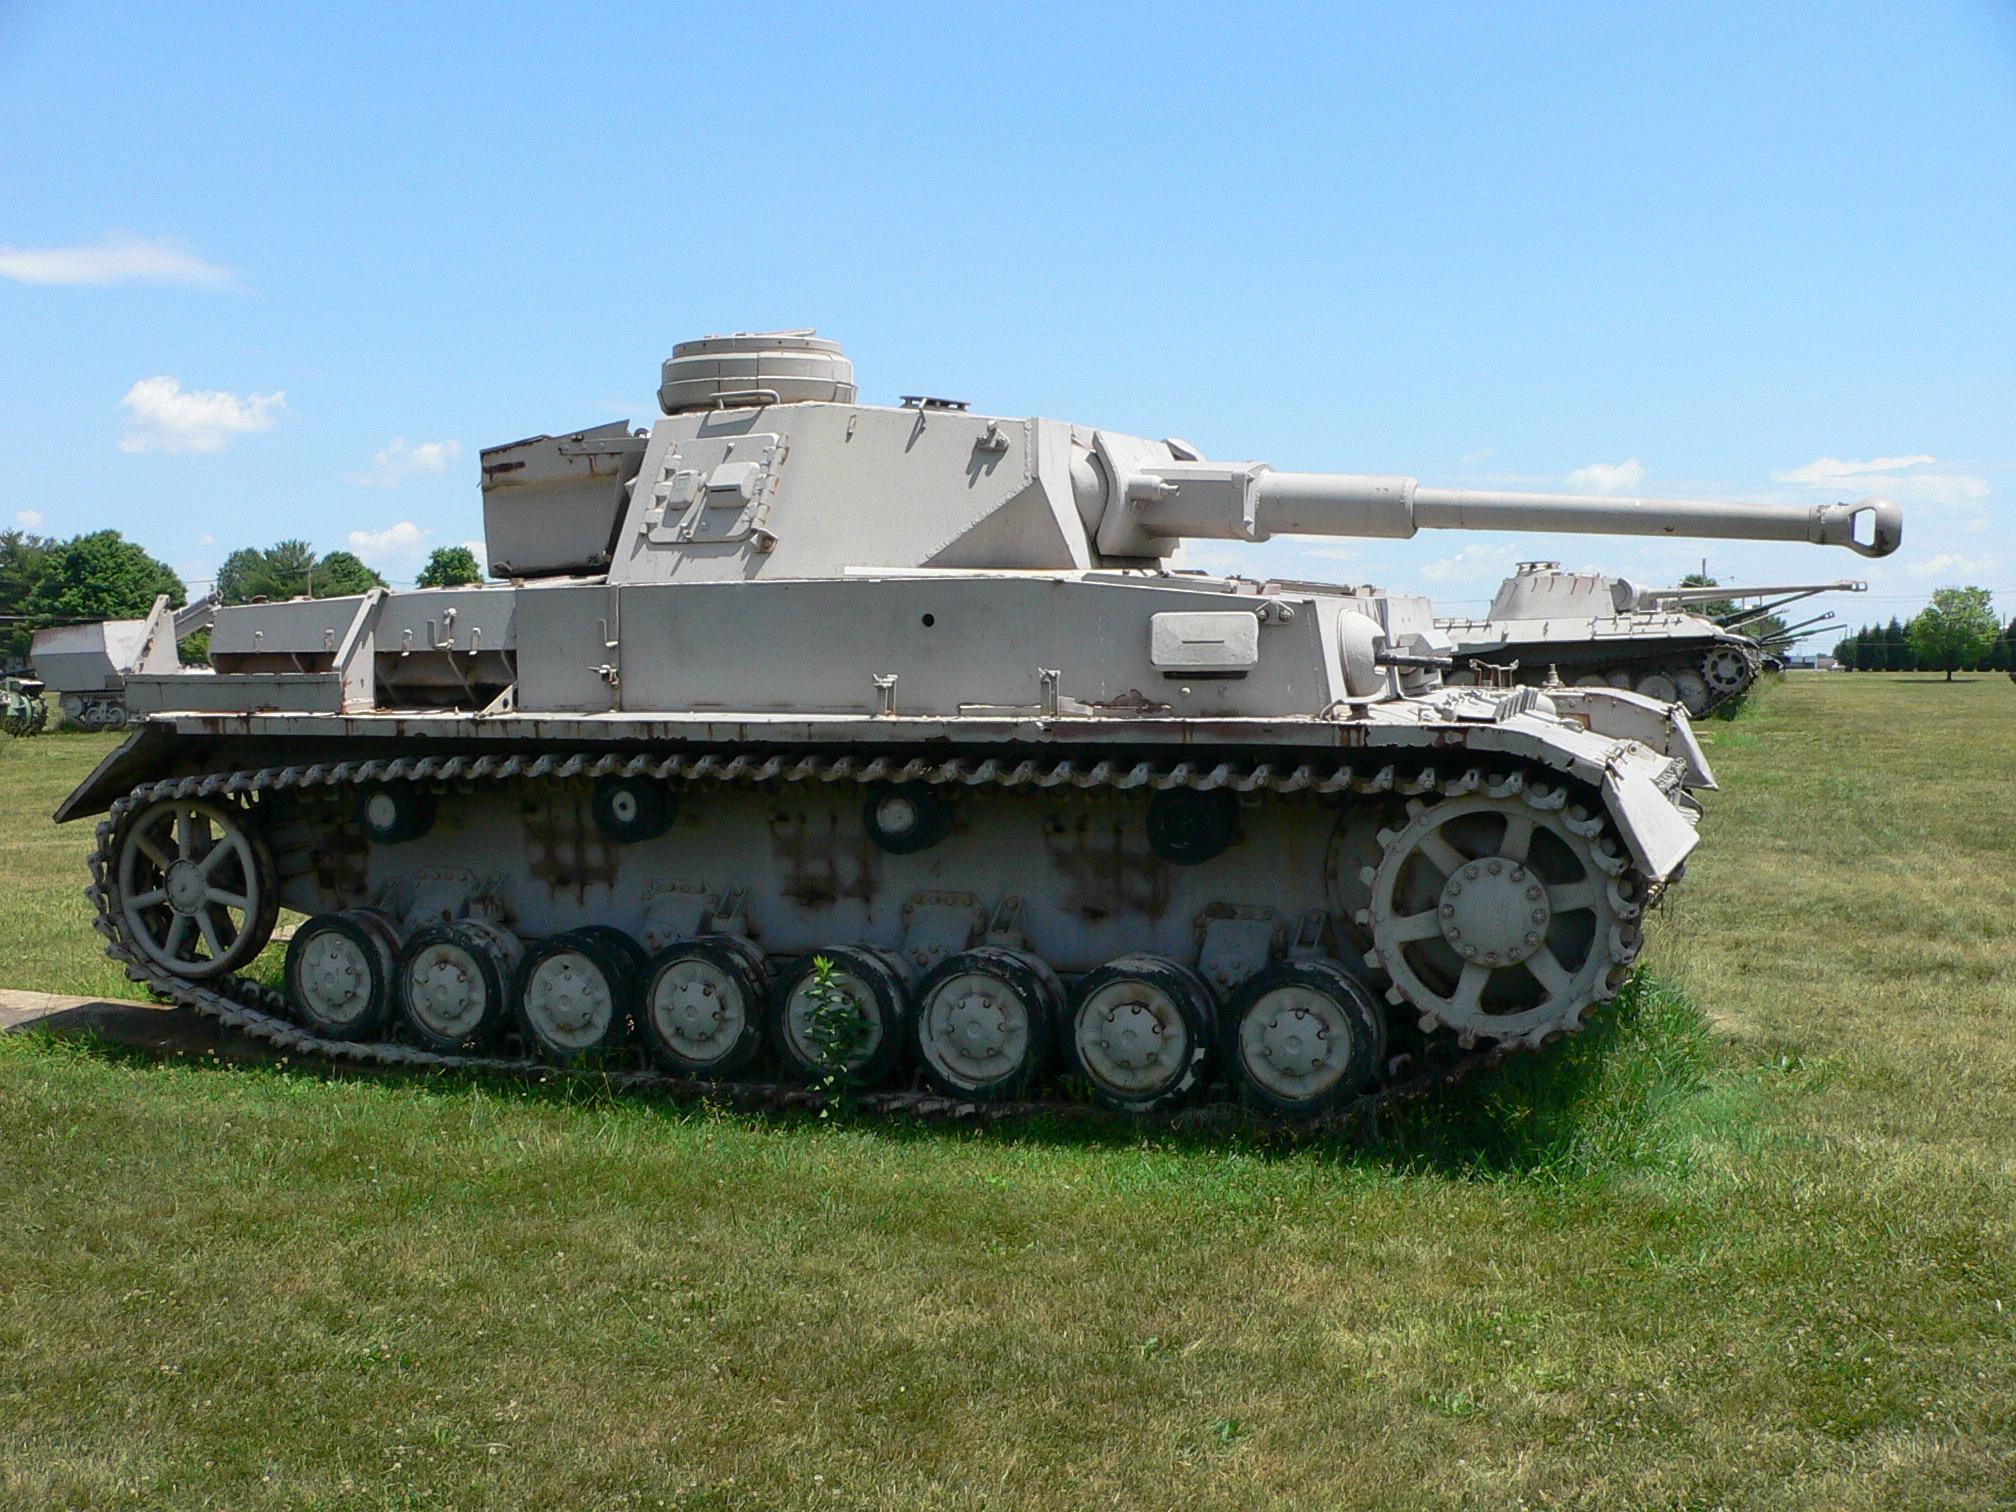 A German panzer used during World War II